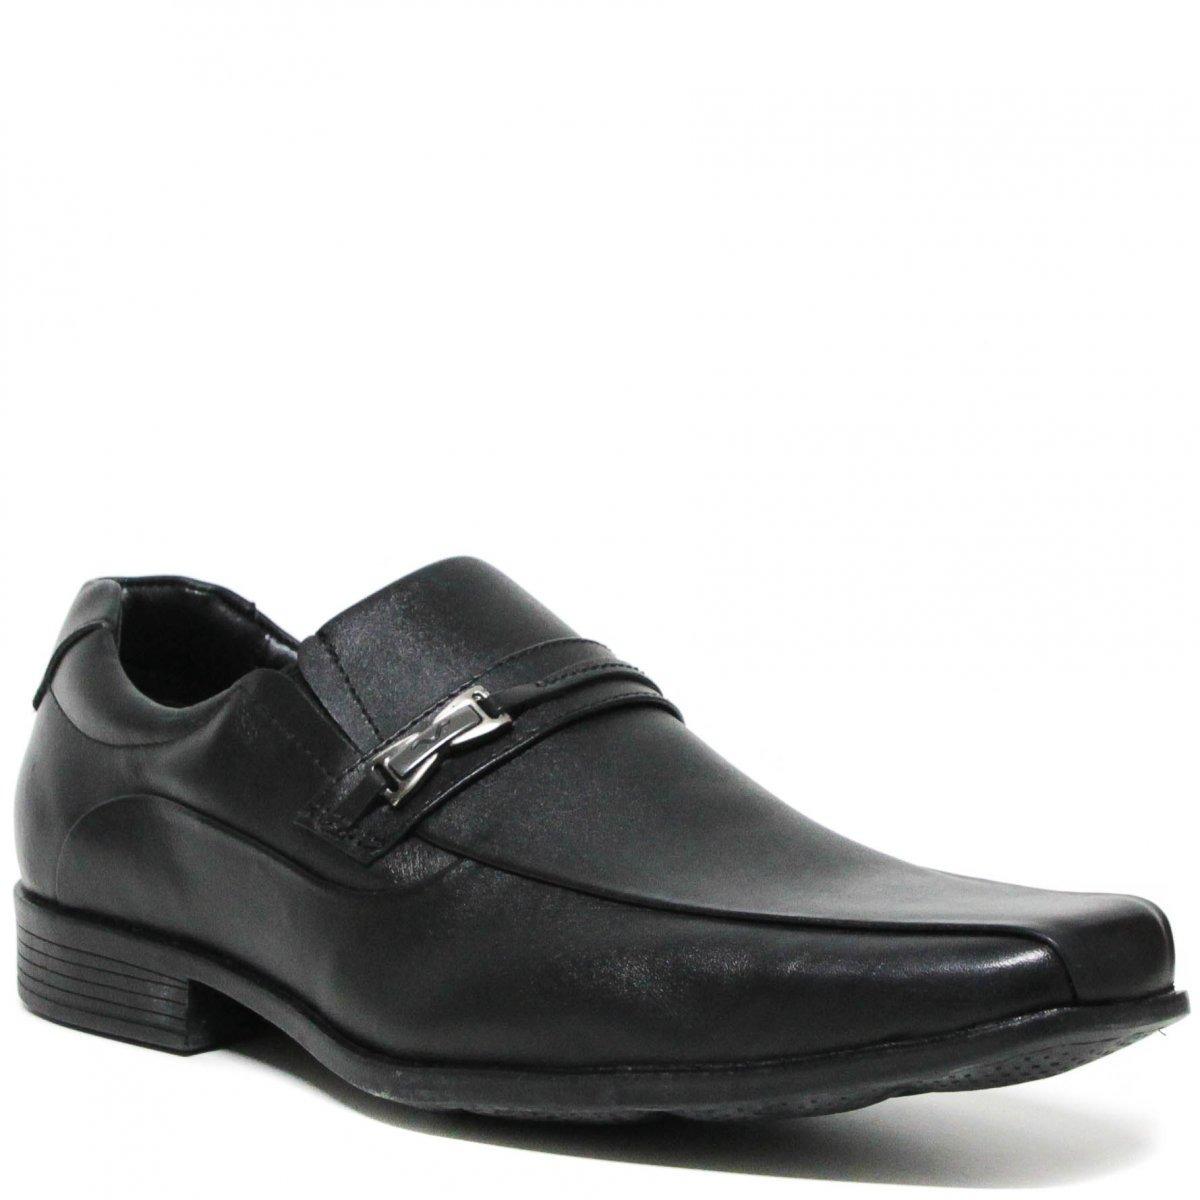 1a5732459 Sapato Masculino Mariner Aston 77500 Modelo 77521 - R$ 149,99 em ...